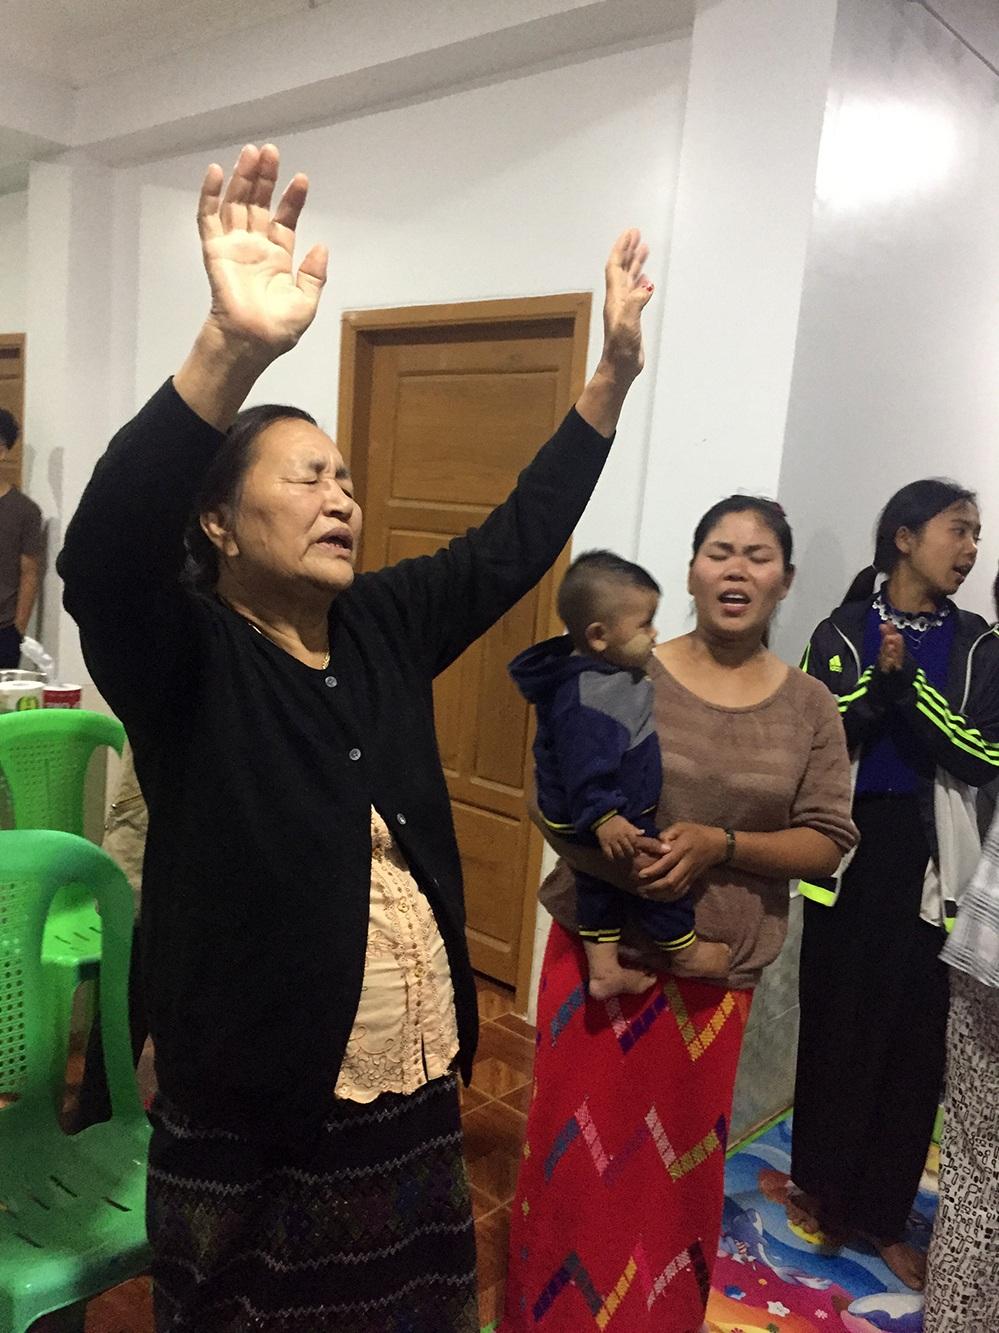 David's mother lives to worship God